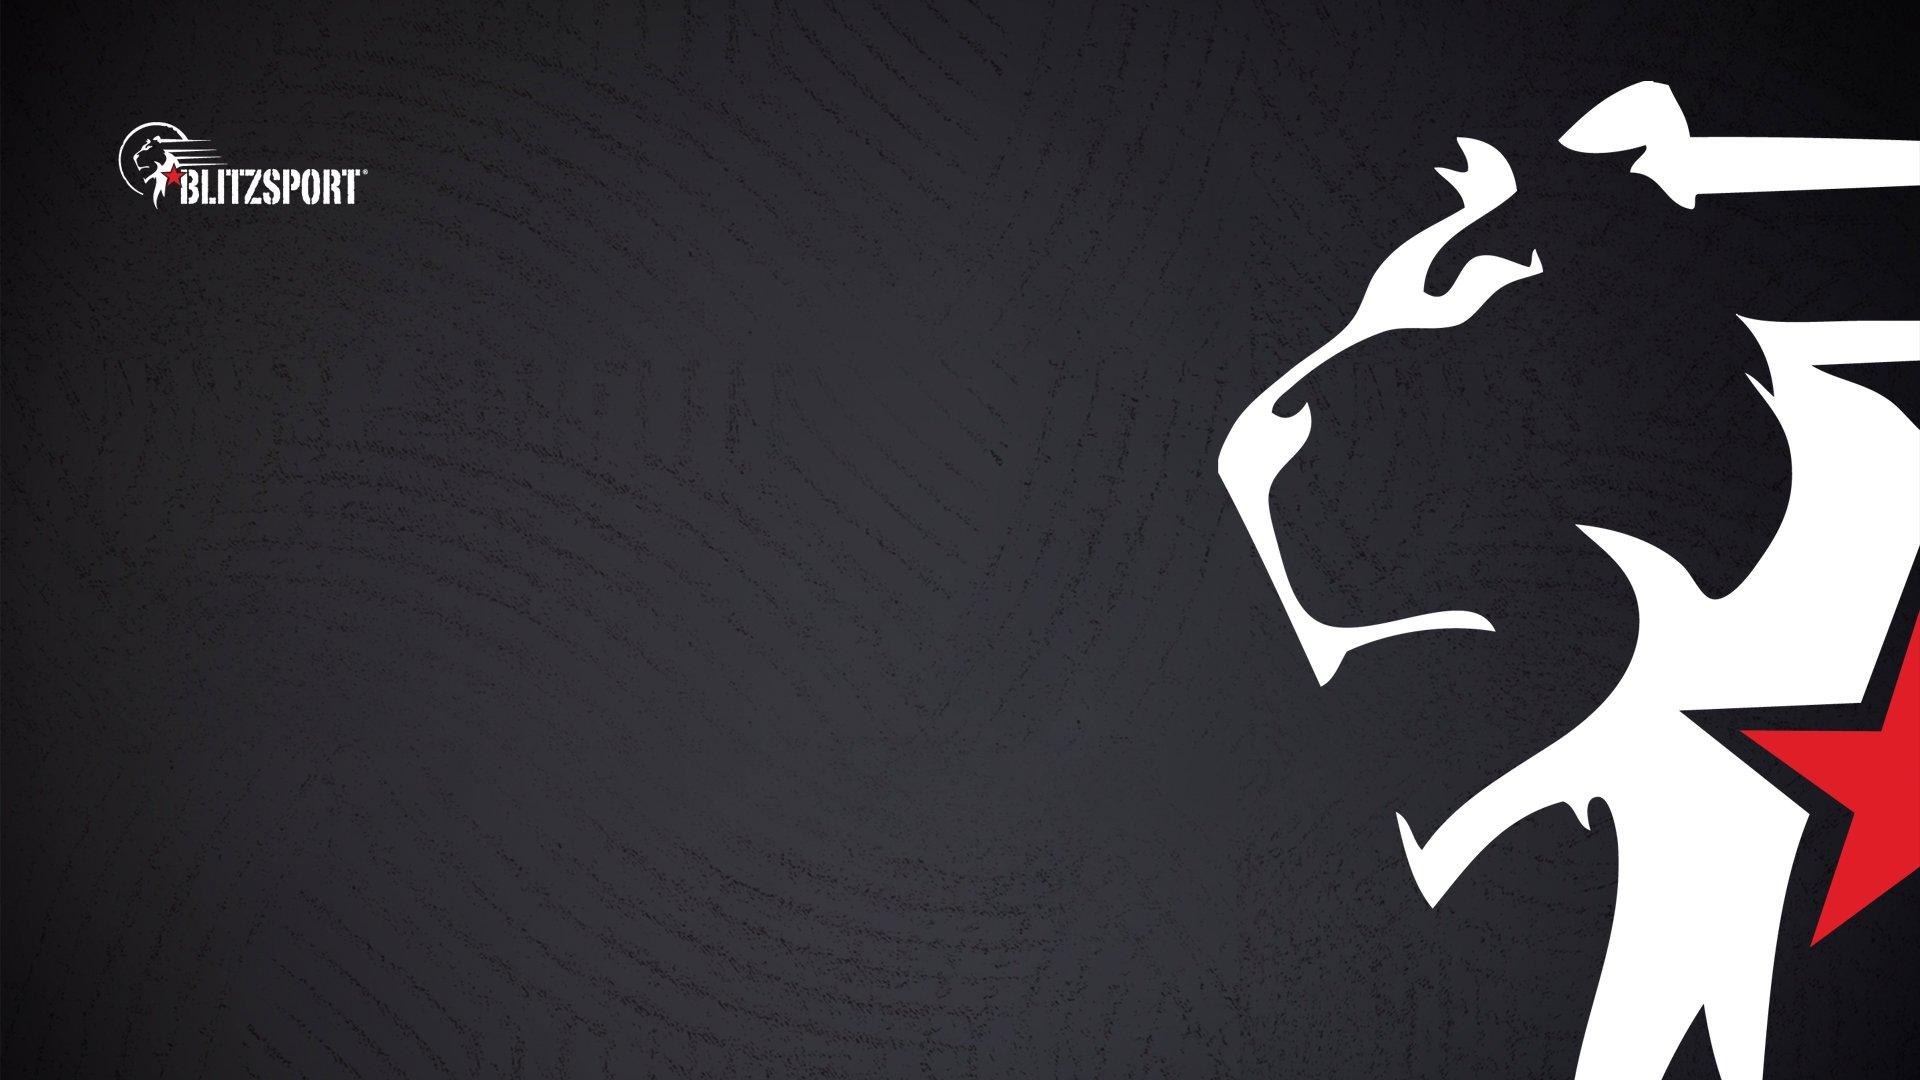 Sport Logo Iphone Wallpaper: Sports Logo Wallpaper